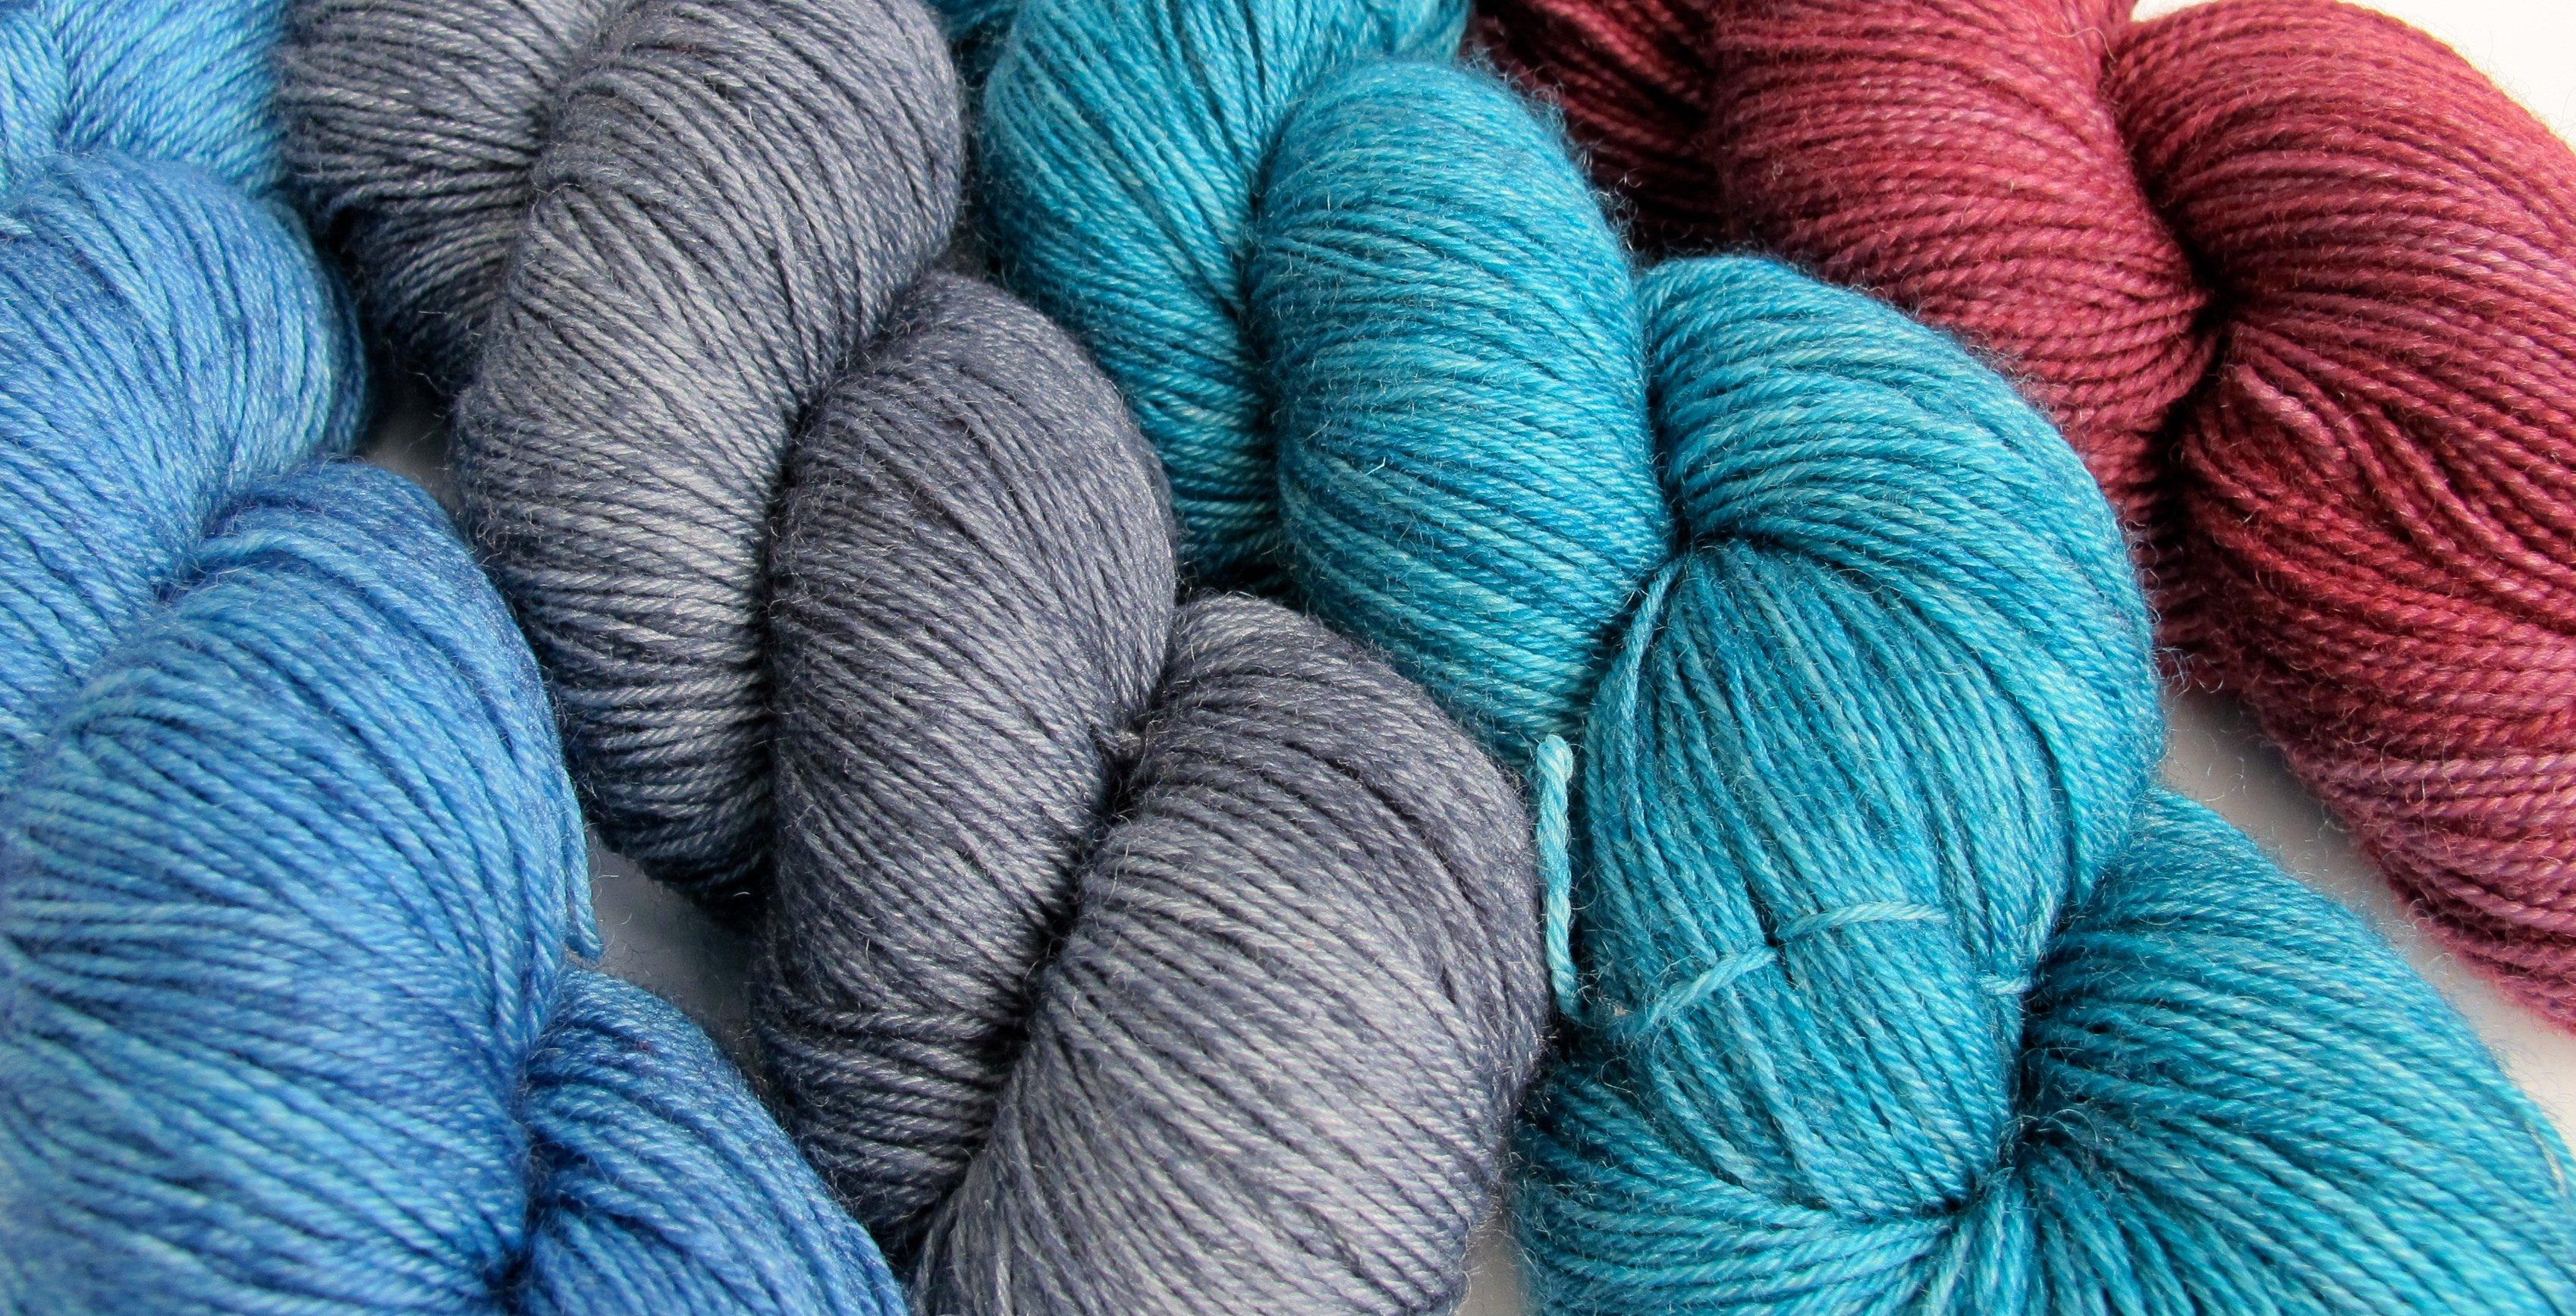 yarn string pattern knitting rope psychedelic bokeh craft